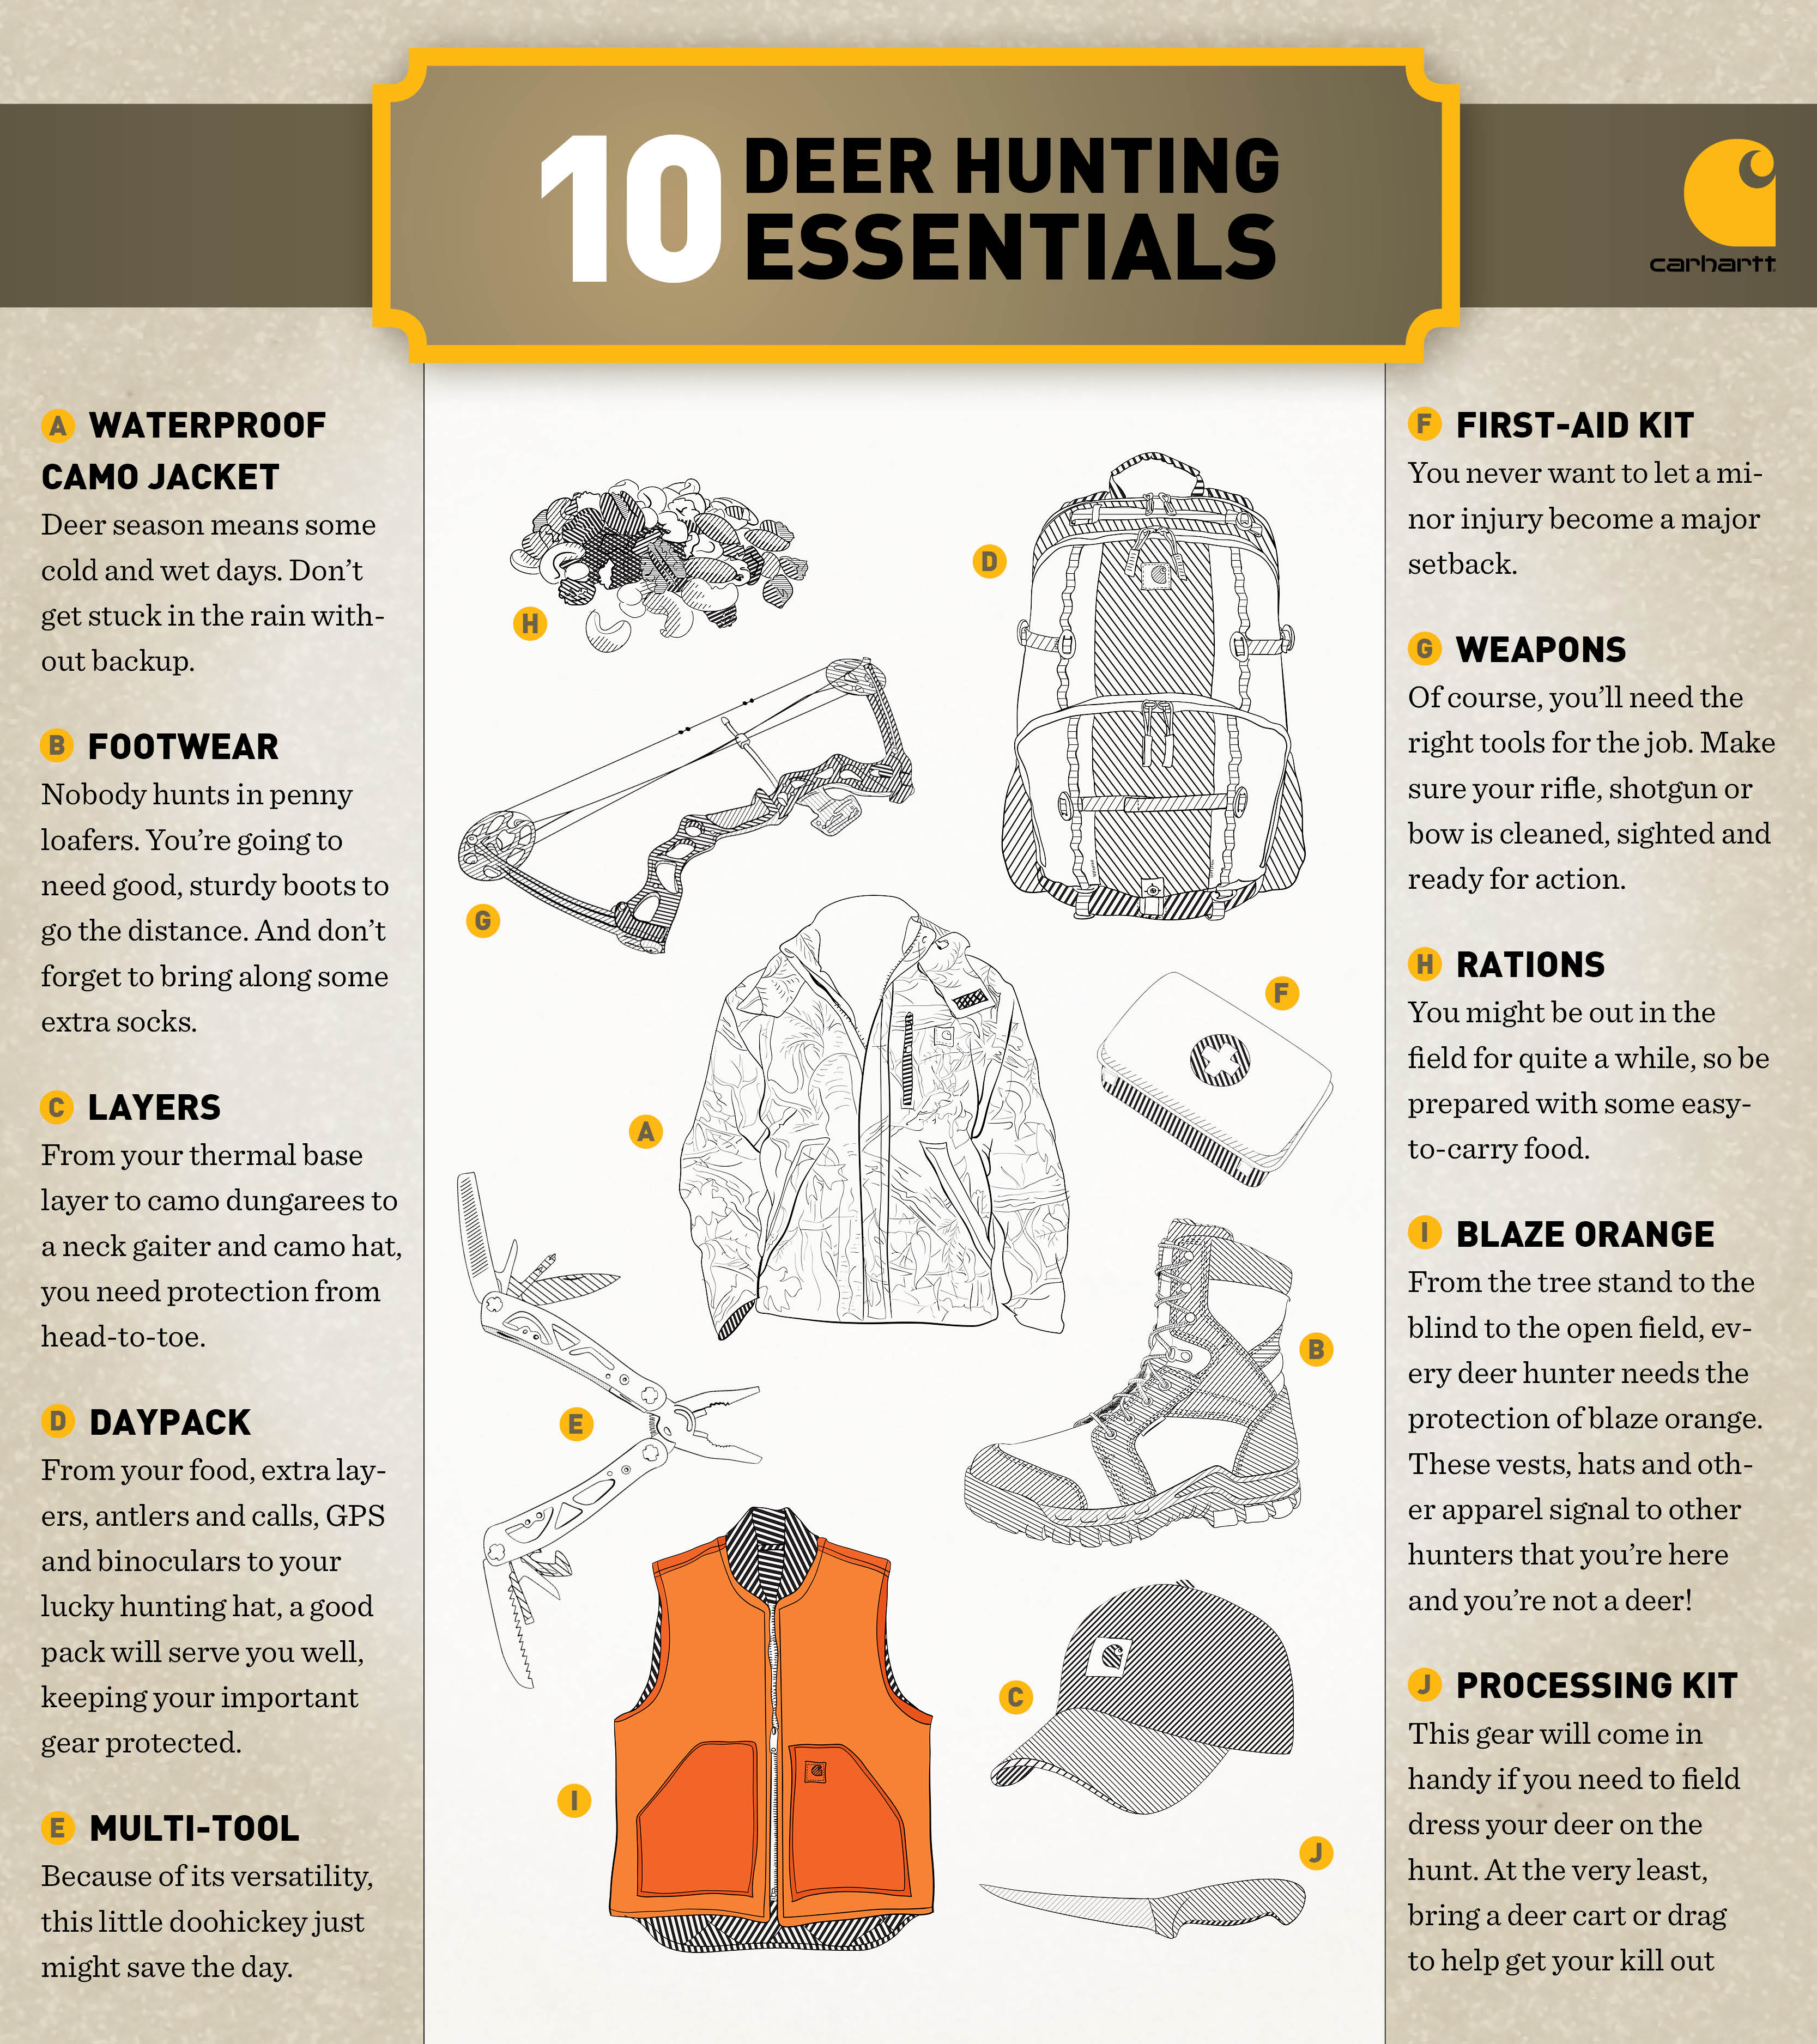 Carhartt deer hunting infographic